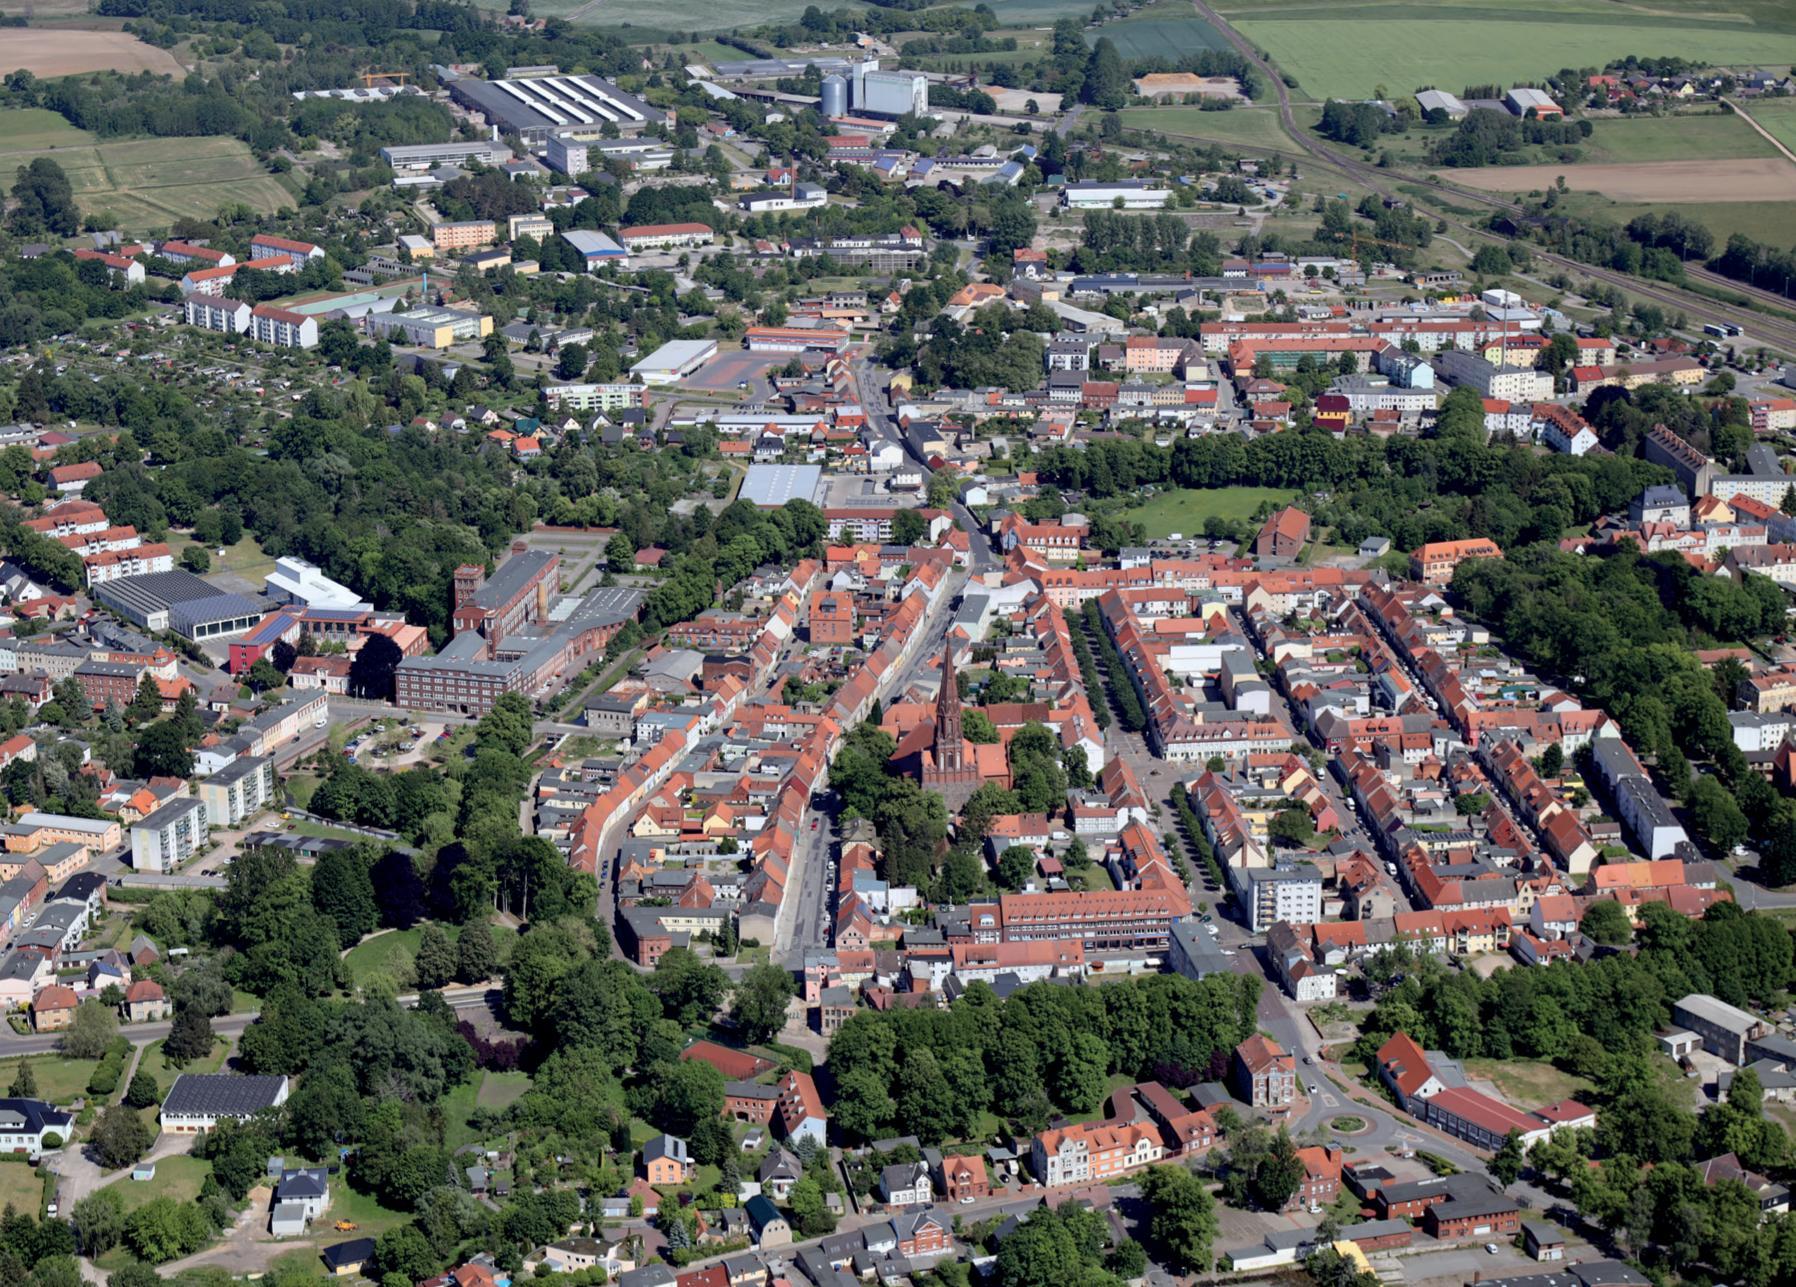 Altstadt Luftbild